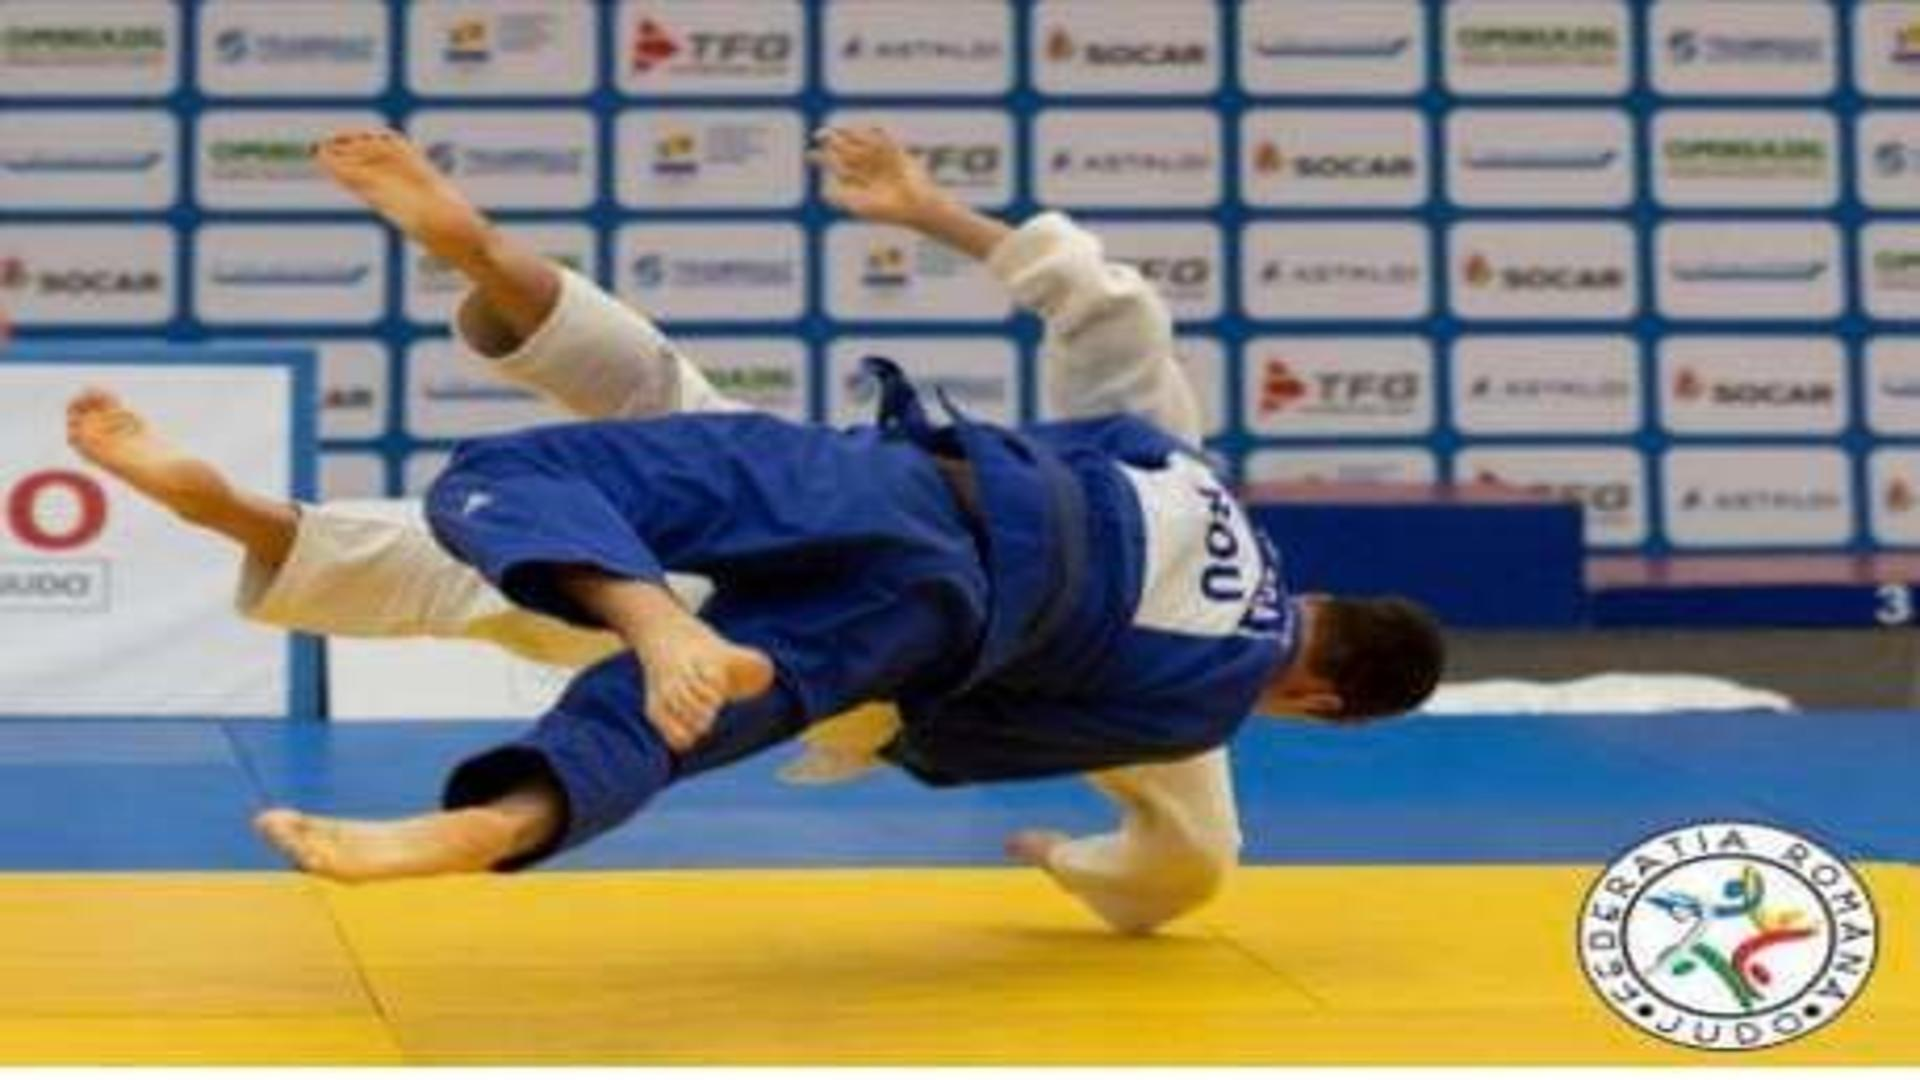 Concurs internațional de judo post-pandemie